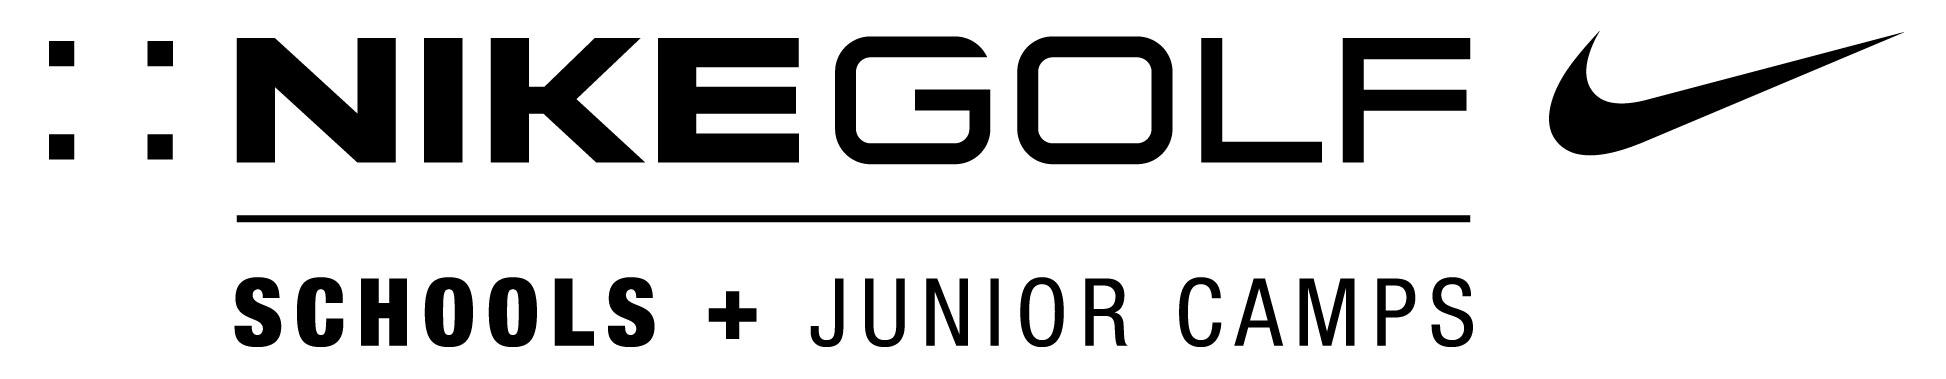 NIKE Junior Golf Camps, Lawrenceville School